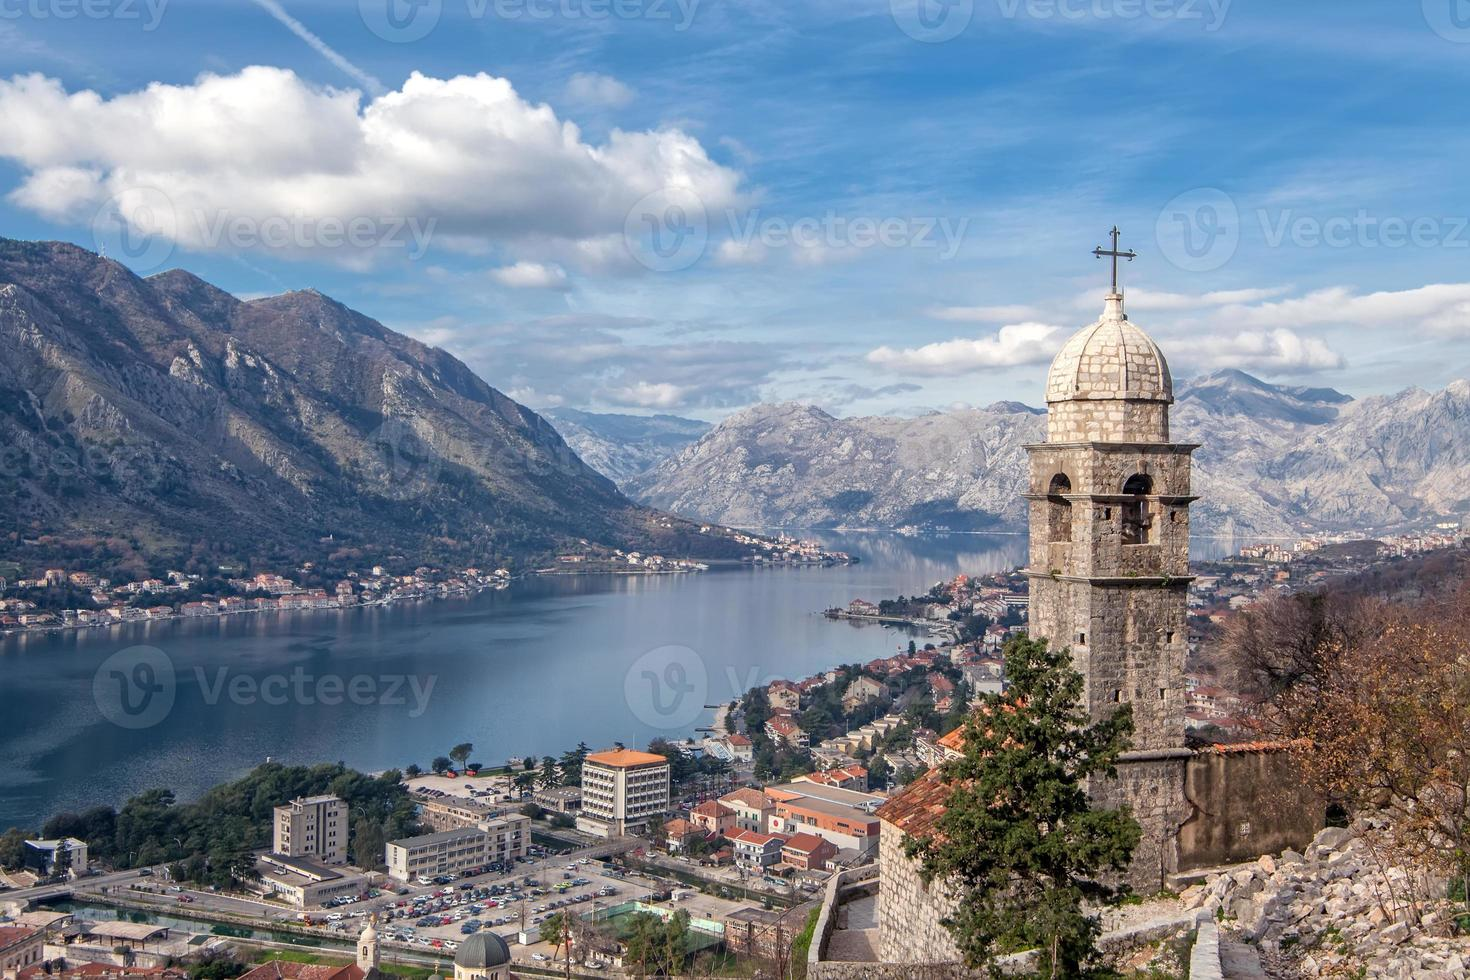 Bay of Kotor, Montenegro. Boka kotorska. photo